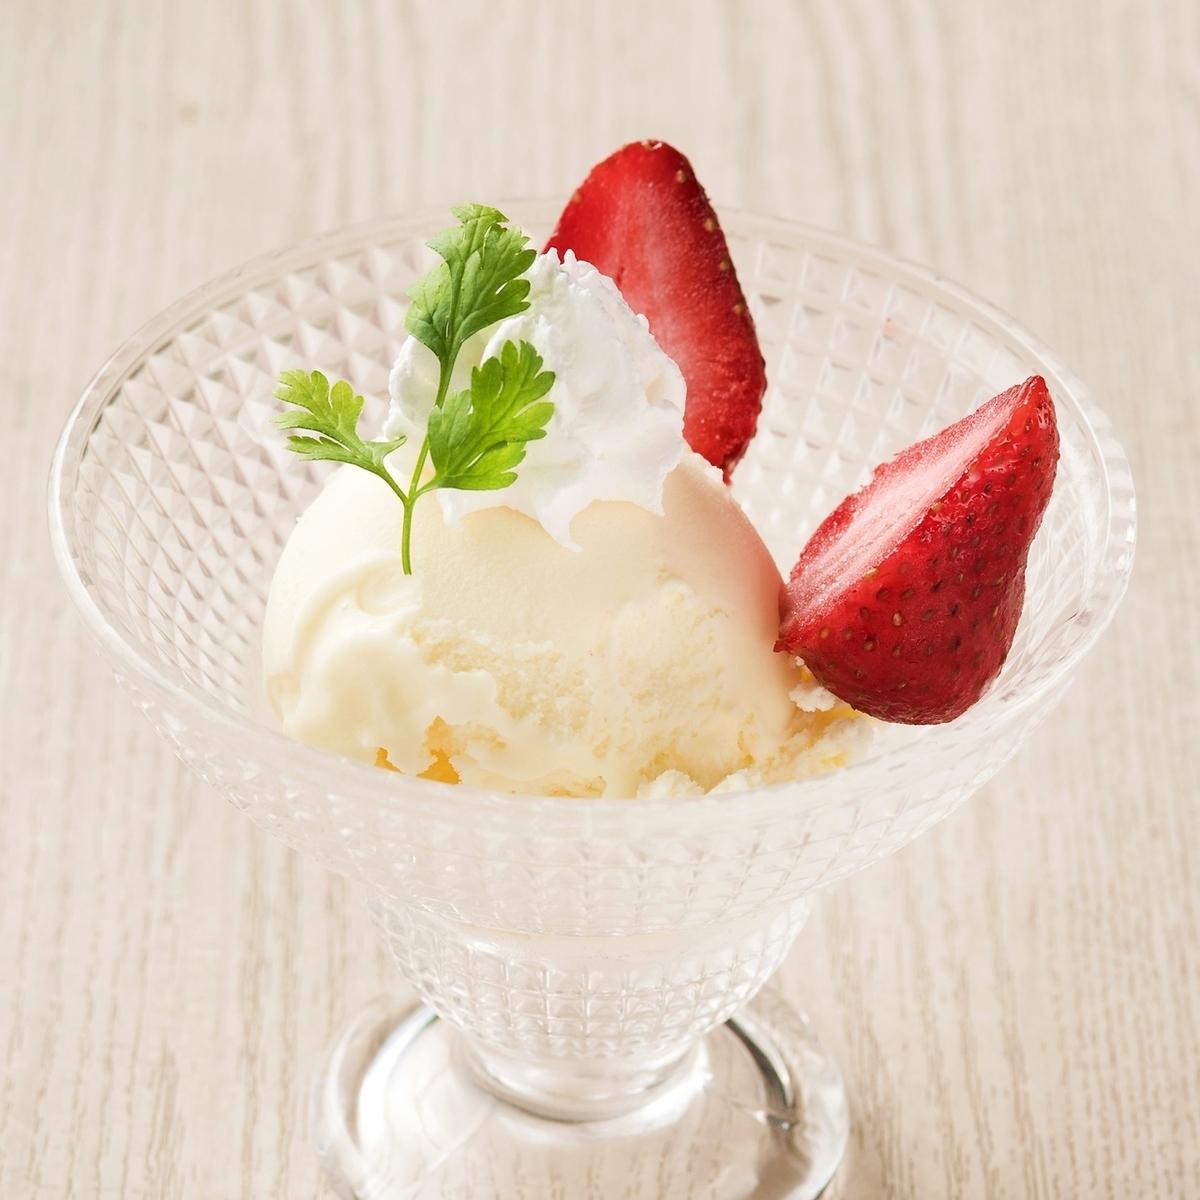 Dairy vanilla ice cream